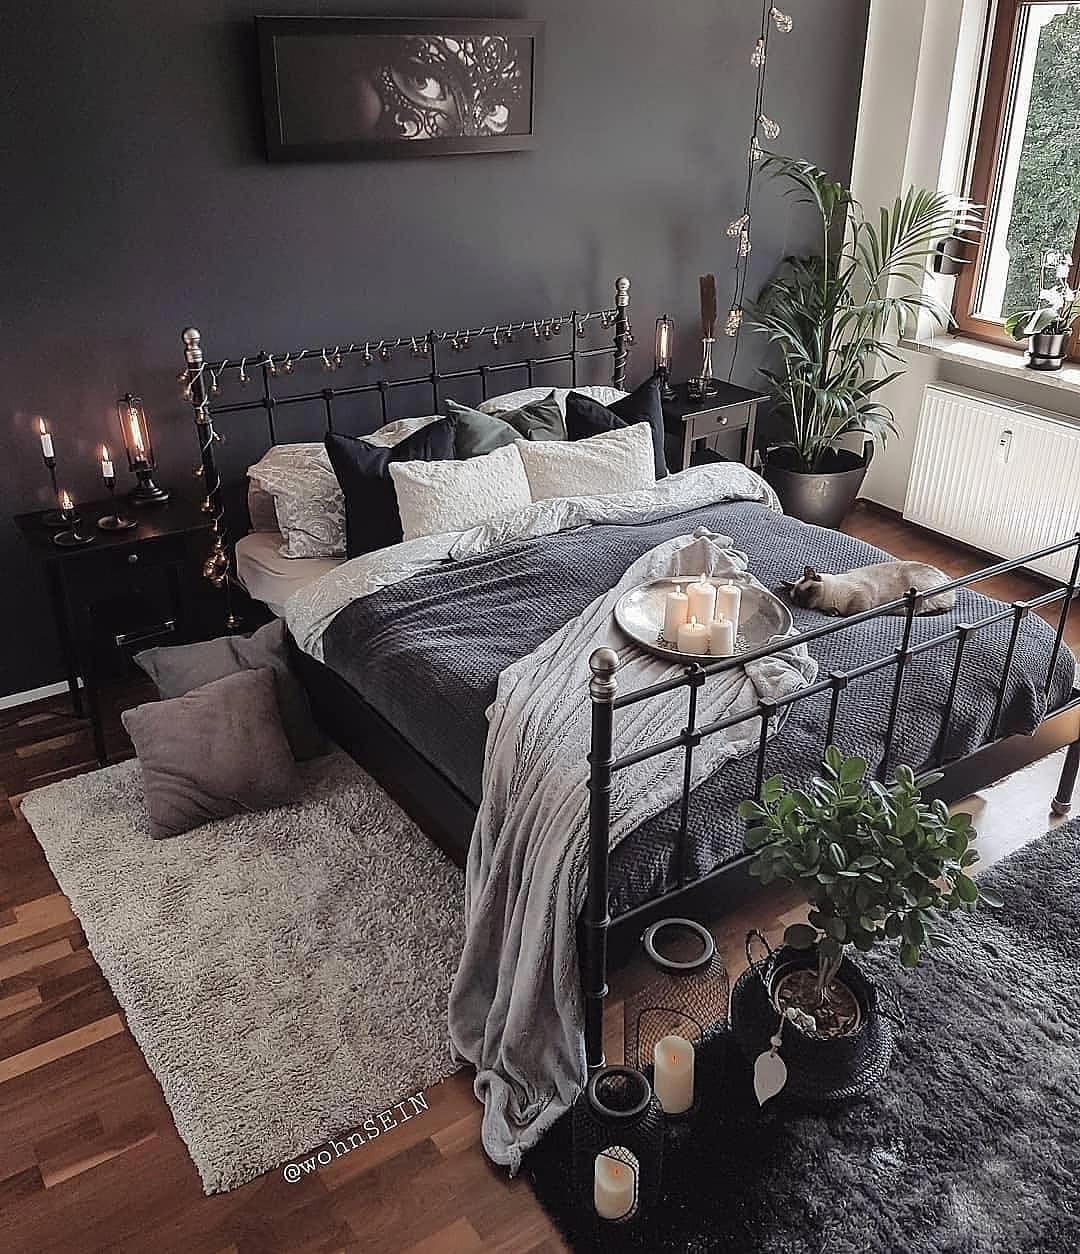 What S Hot On Pinterest 7 Bohemian Interior Design Ideas Minimalist Apartment Decor Cozy Bedroom Warm Home Decor Bedroom Warm bedroom ideas pinterest